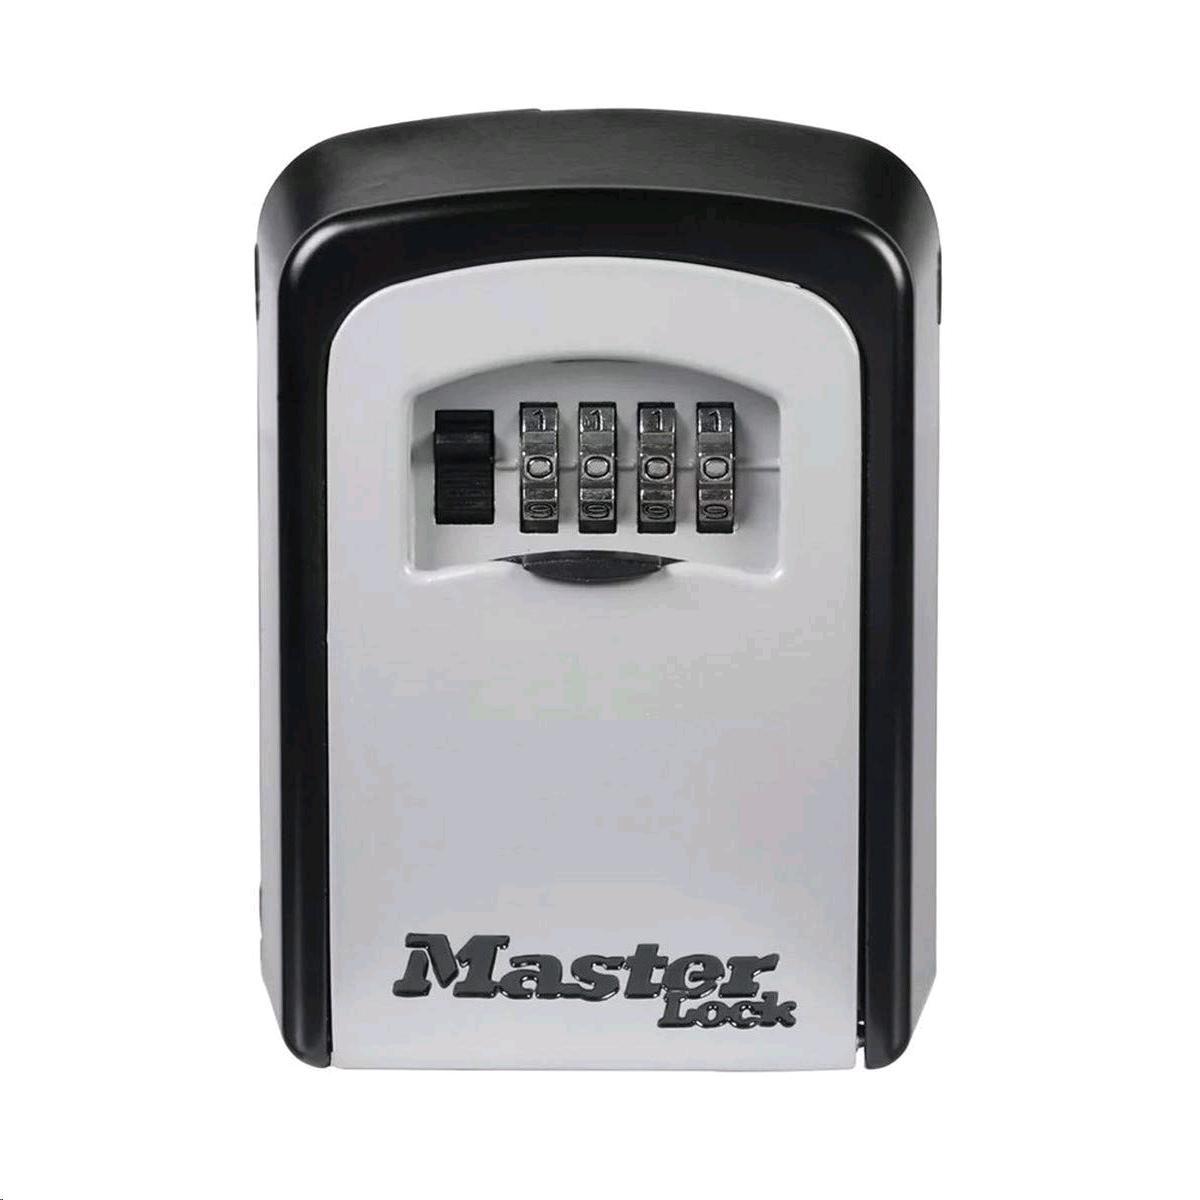 Masterlock Wall Mount Key Safe